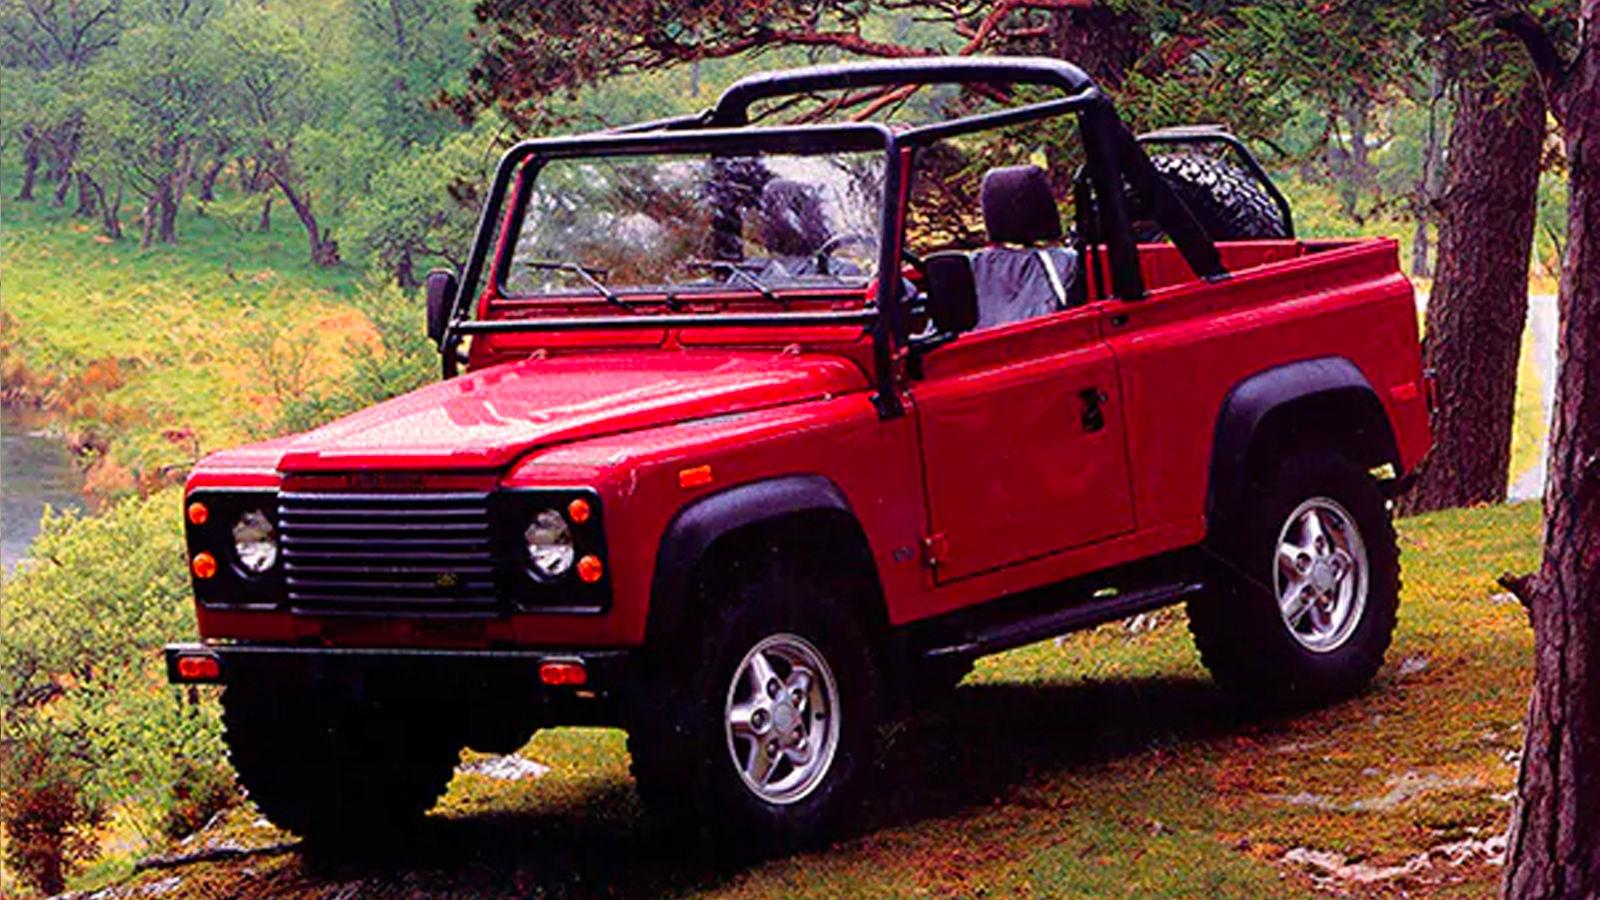 1993 Land Rover Defender 90 North American Specification (NAS) dış devrilme kafesi ve Portofino Red rengiyle tamamlandı